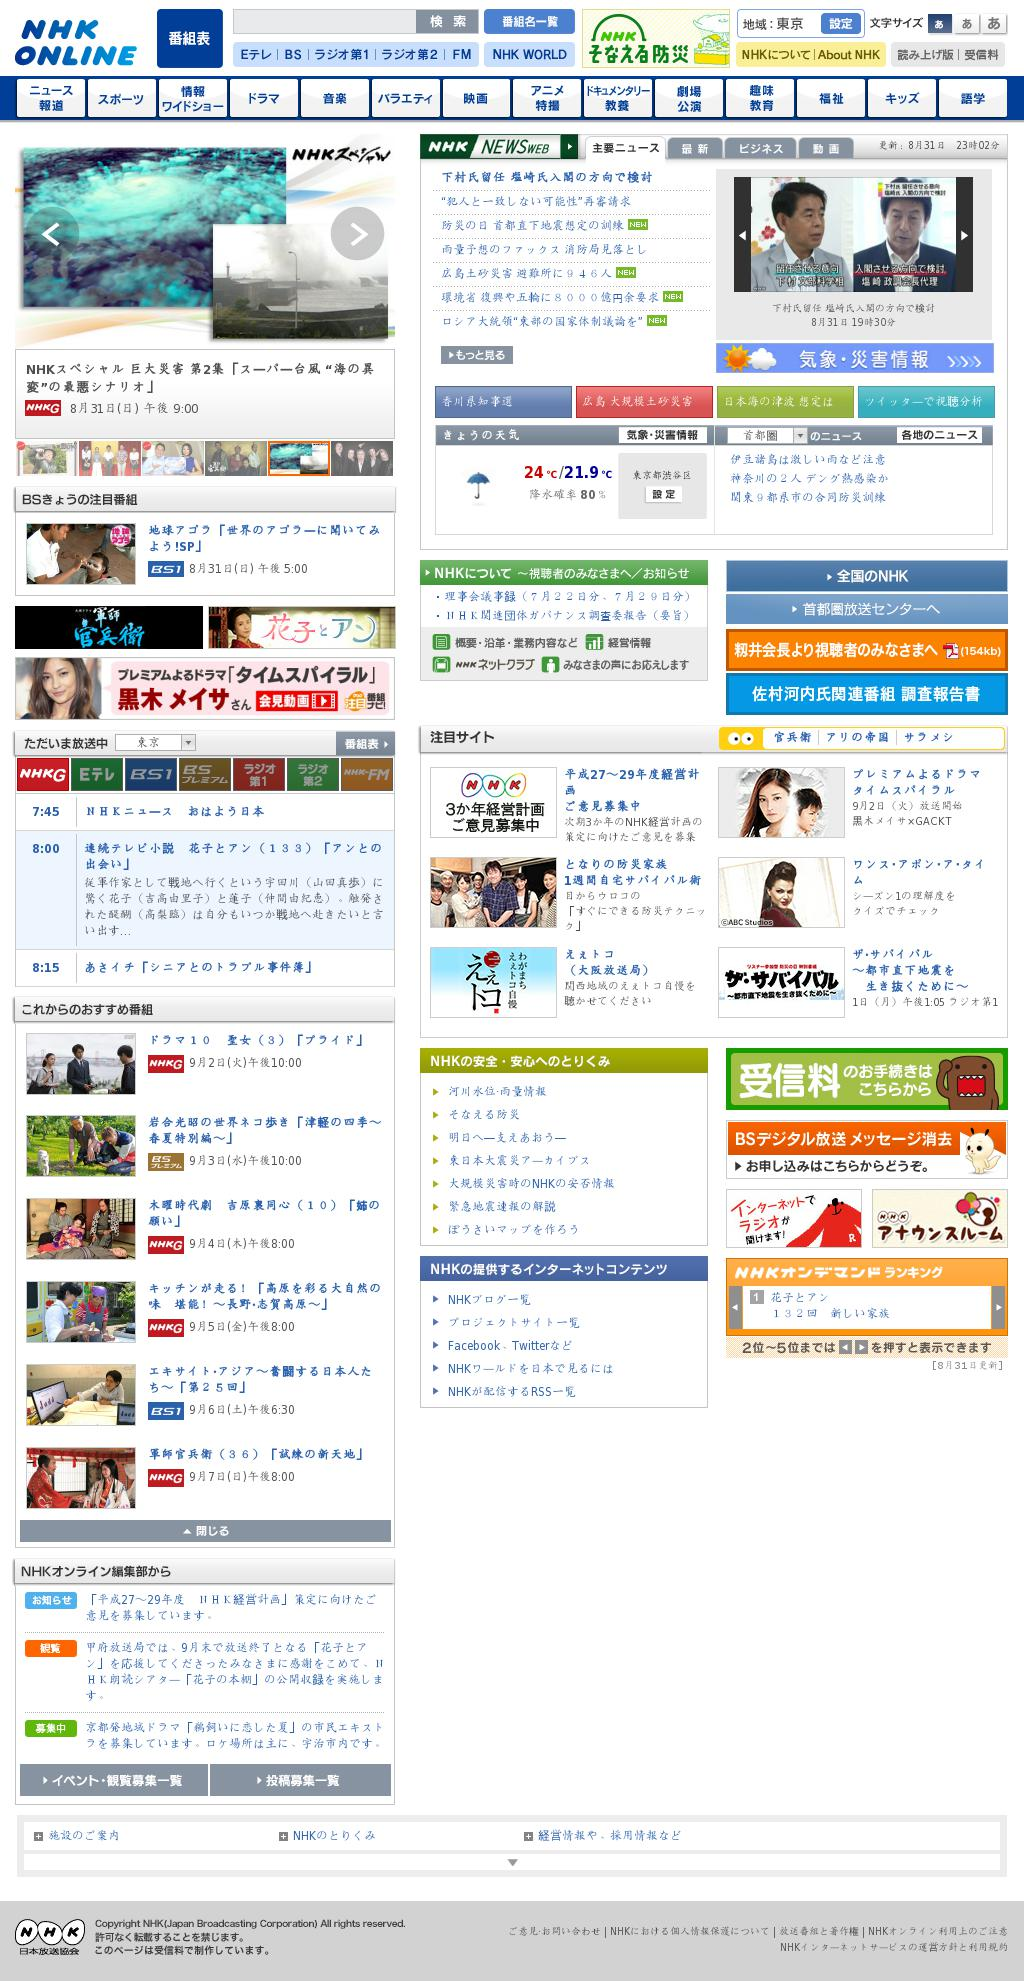 NHK Online at Sunday Aug. 31, 2014, 11:14 p.m. UTC